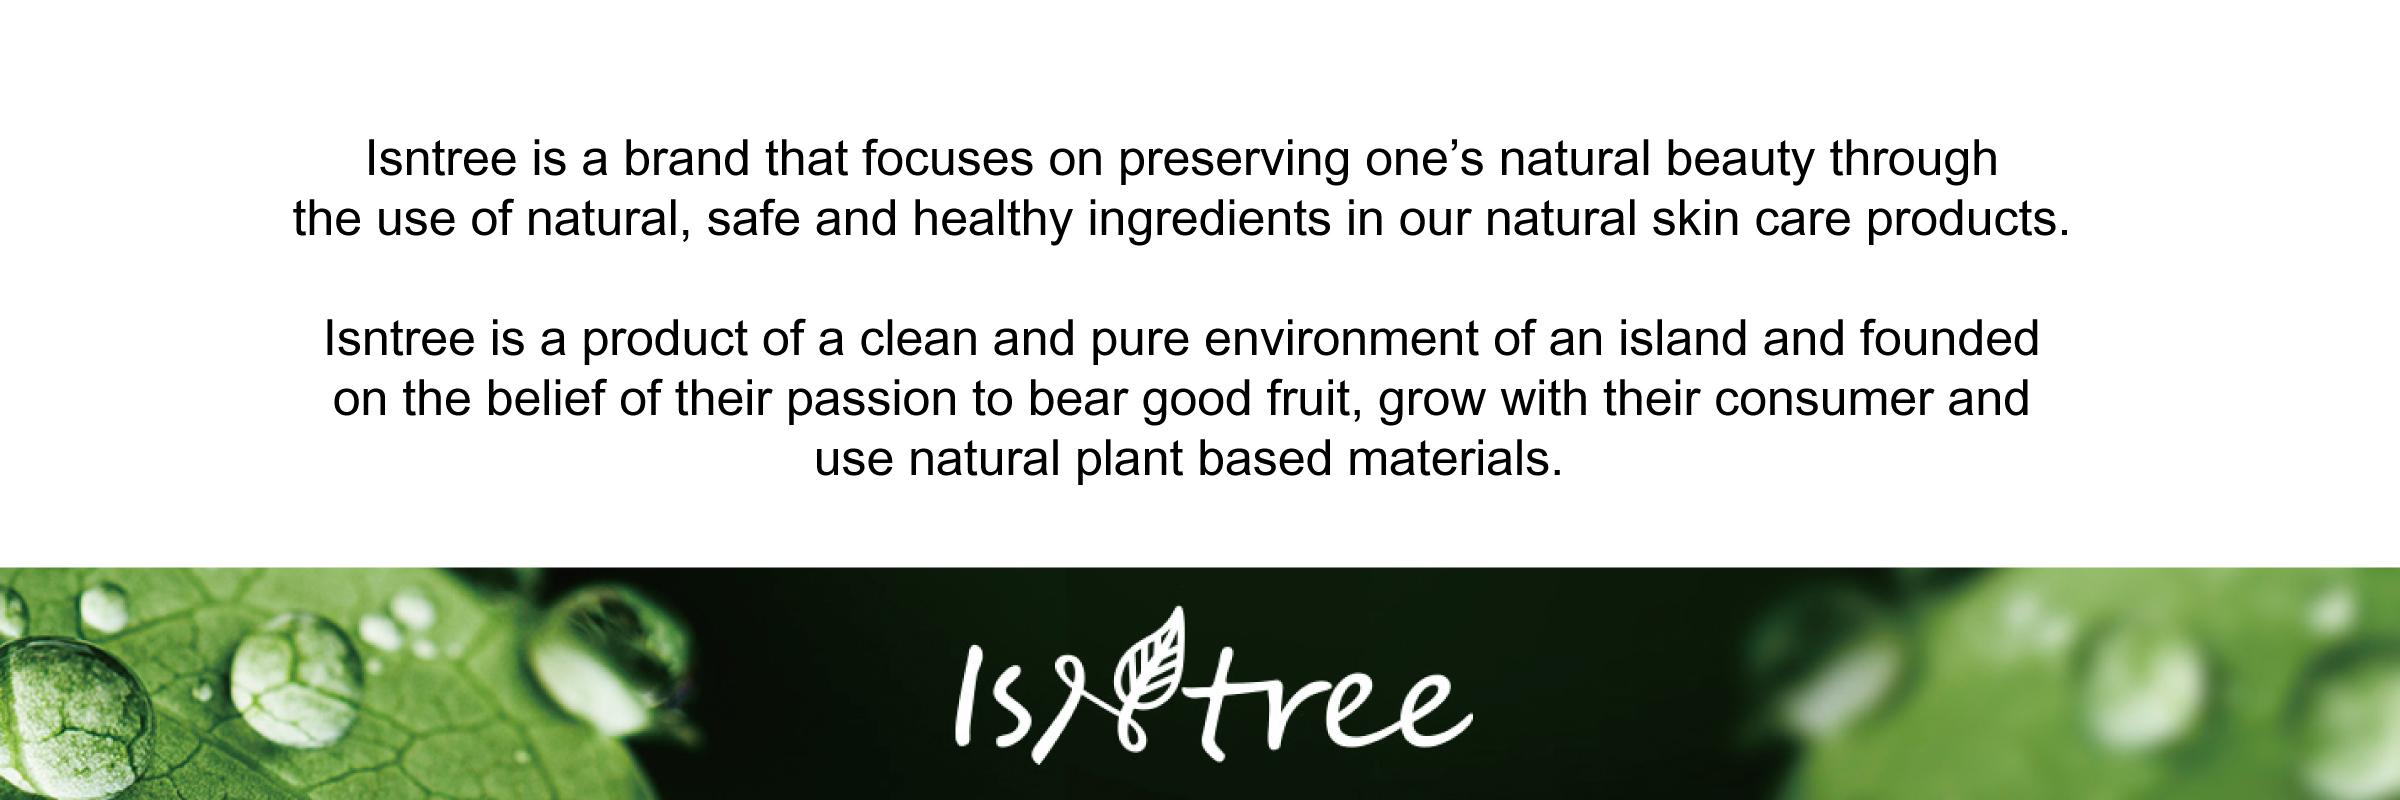 isntree-web-logo.jpg